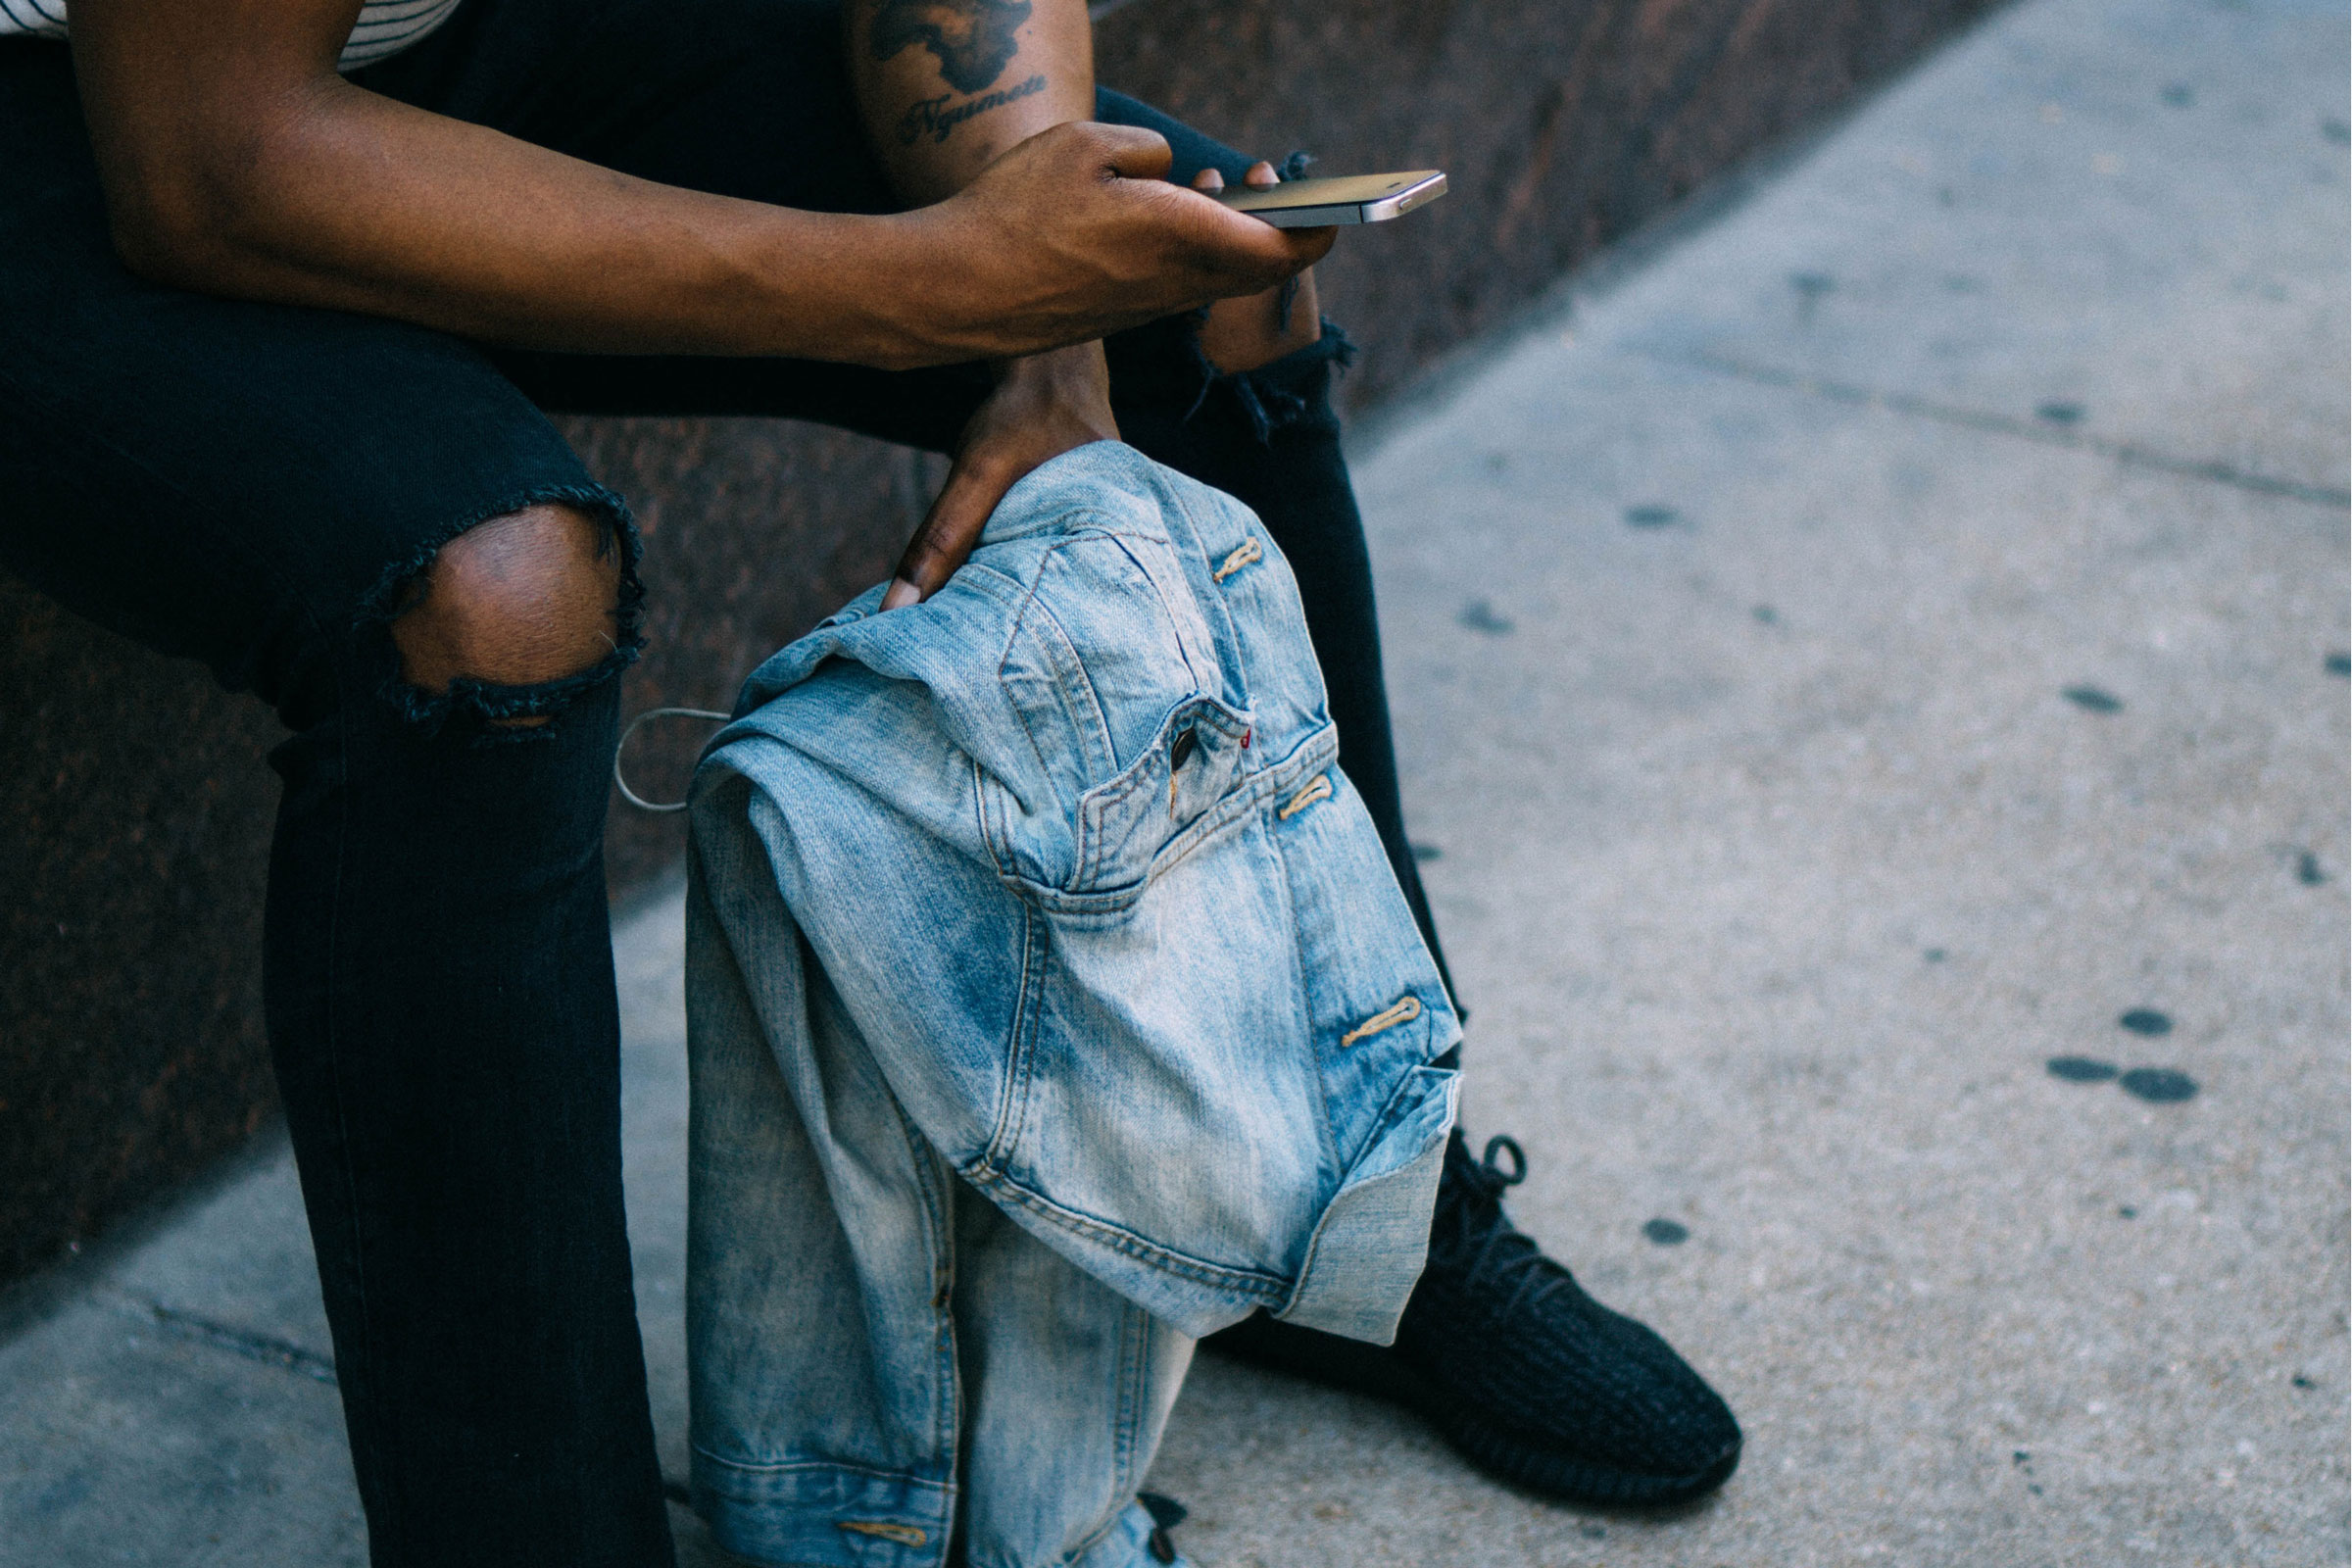 A Black person's hand scrolls through their iPhone.